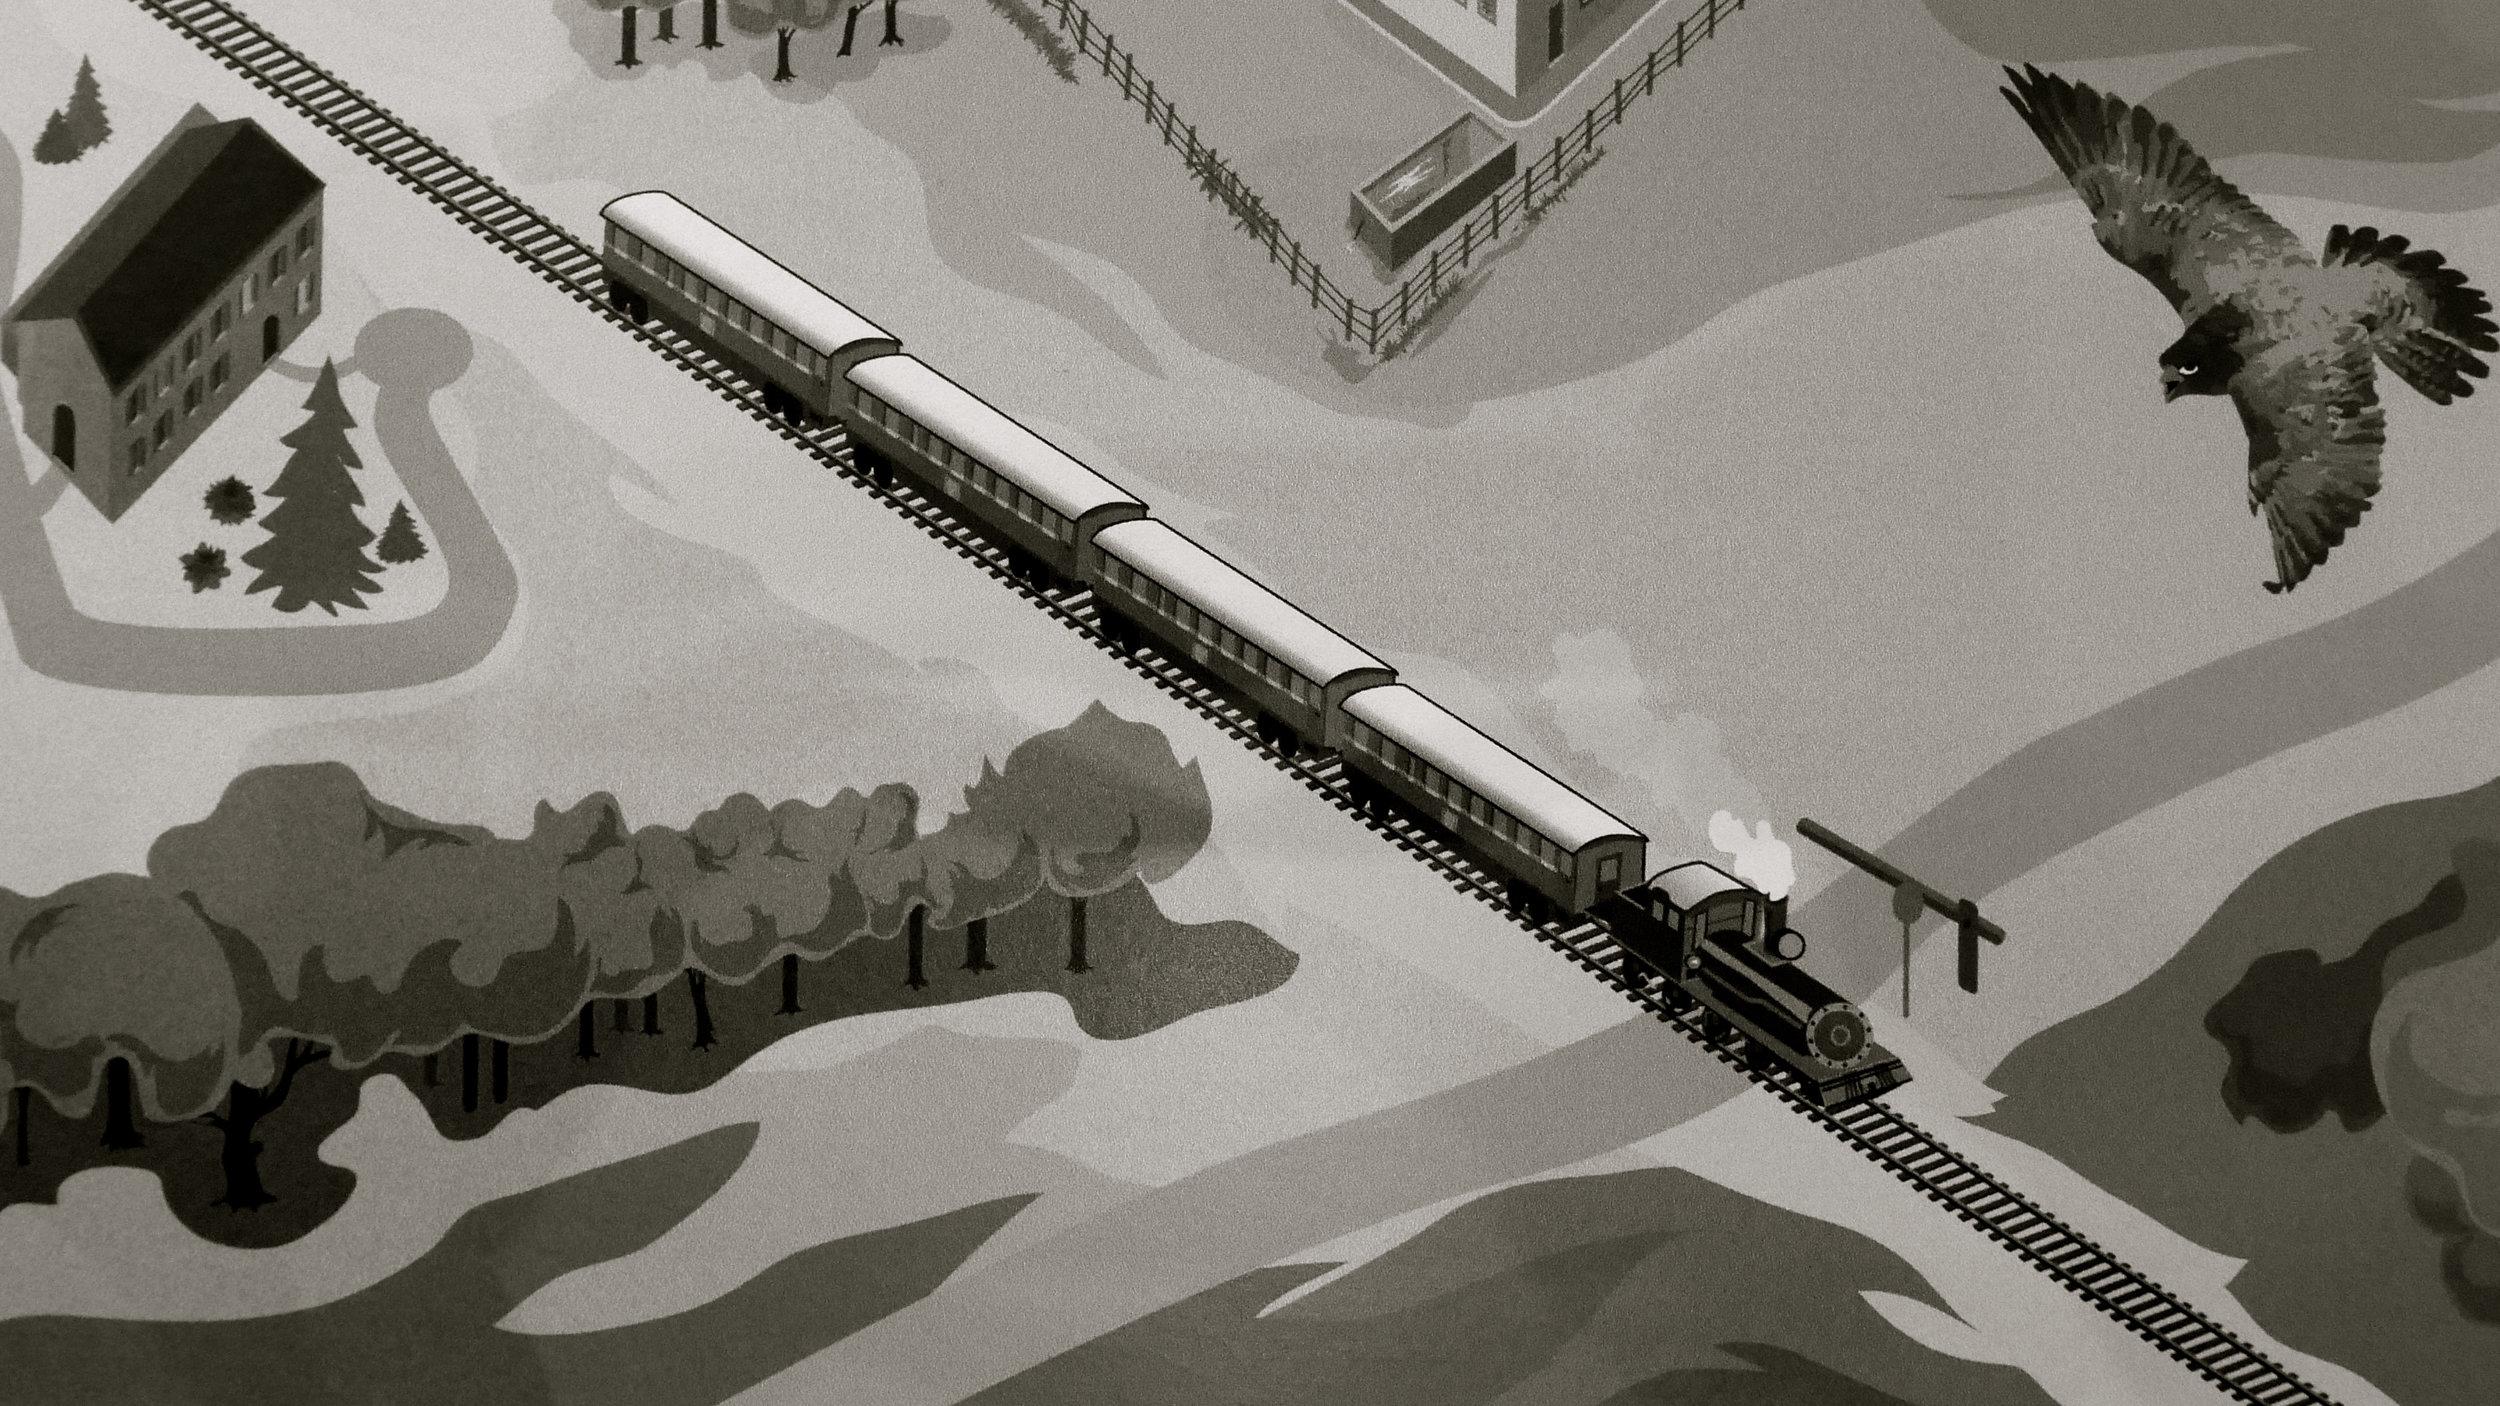 Jimi Hendrix - Hear My Train A Comin'  - 1